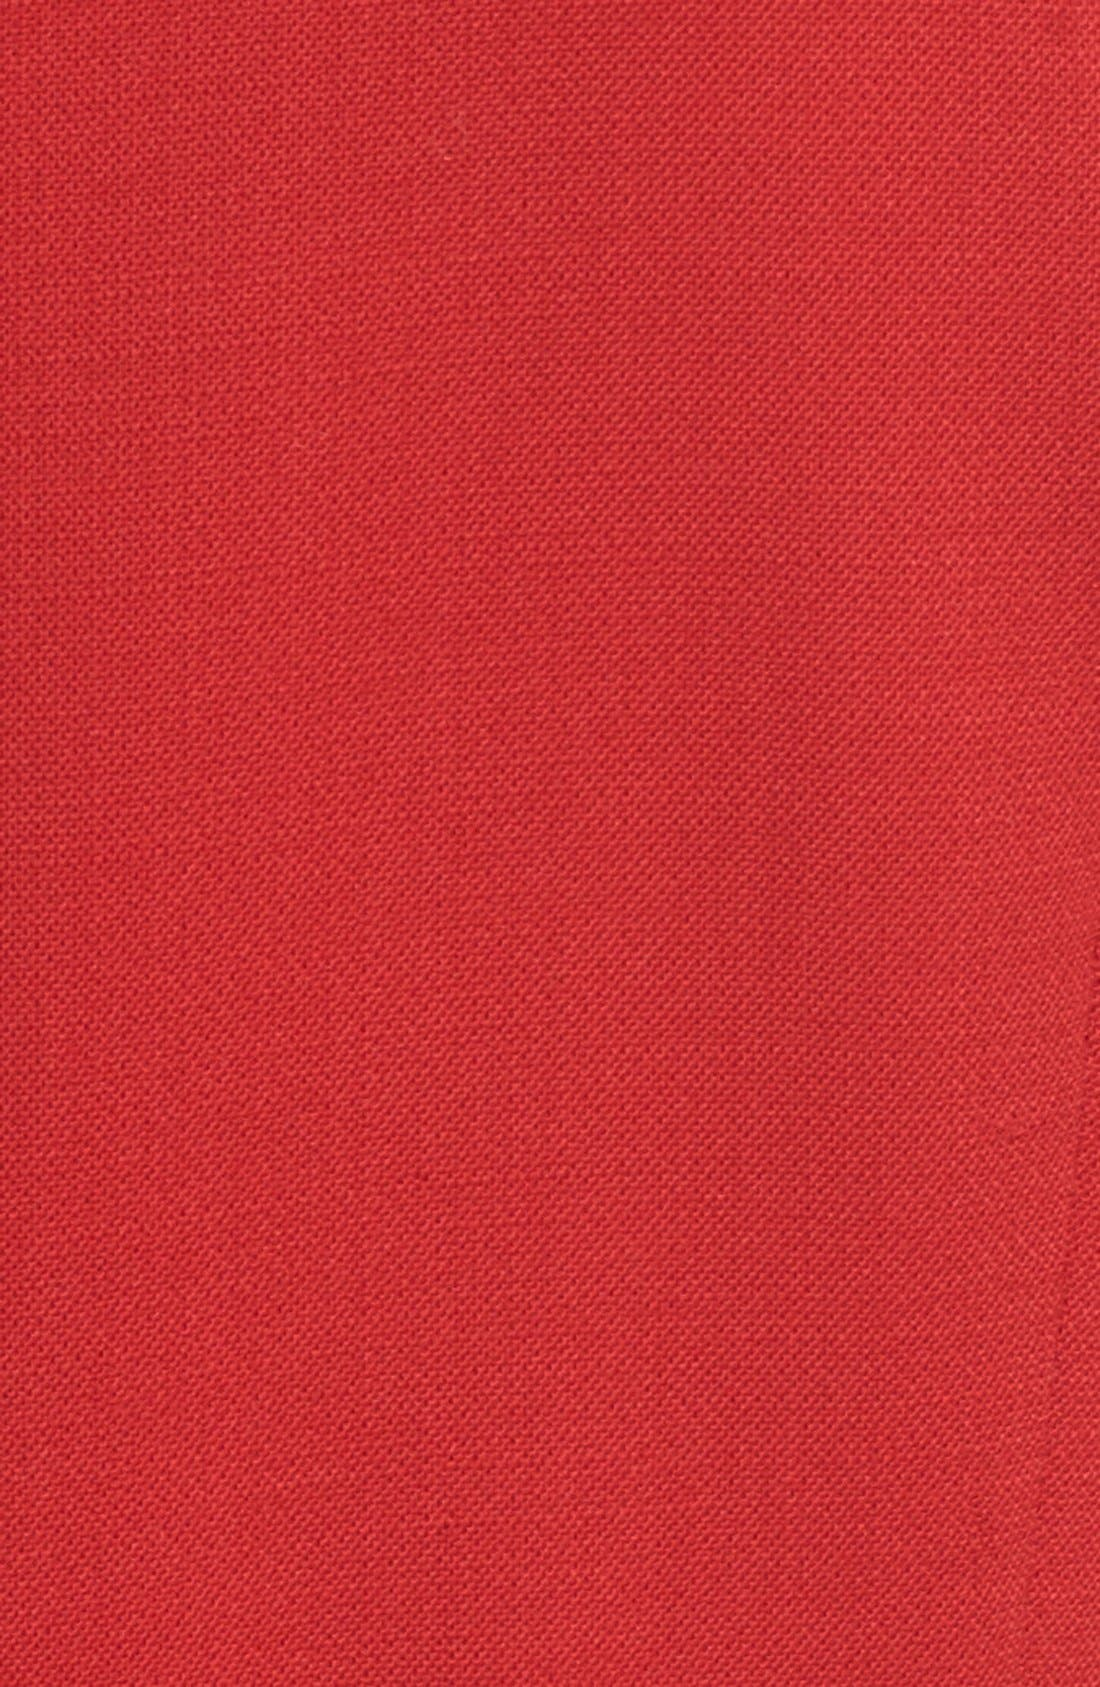 Alternate Image 3  - Max Mara 'Brado' Doppio Crepe Stretch Wool Sheath Dress